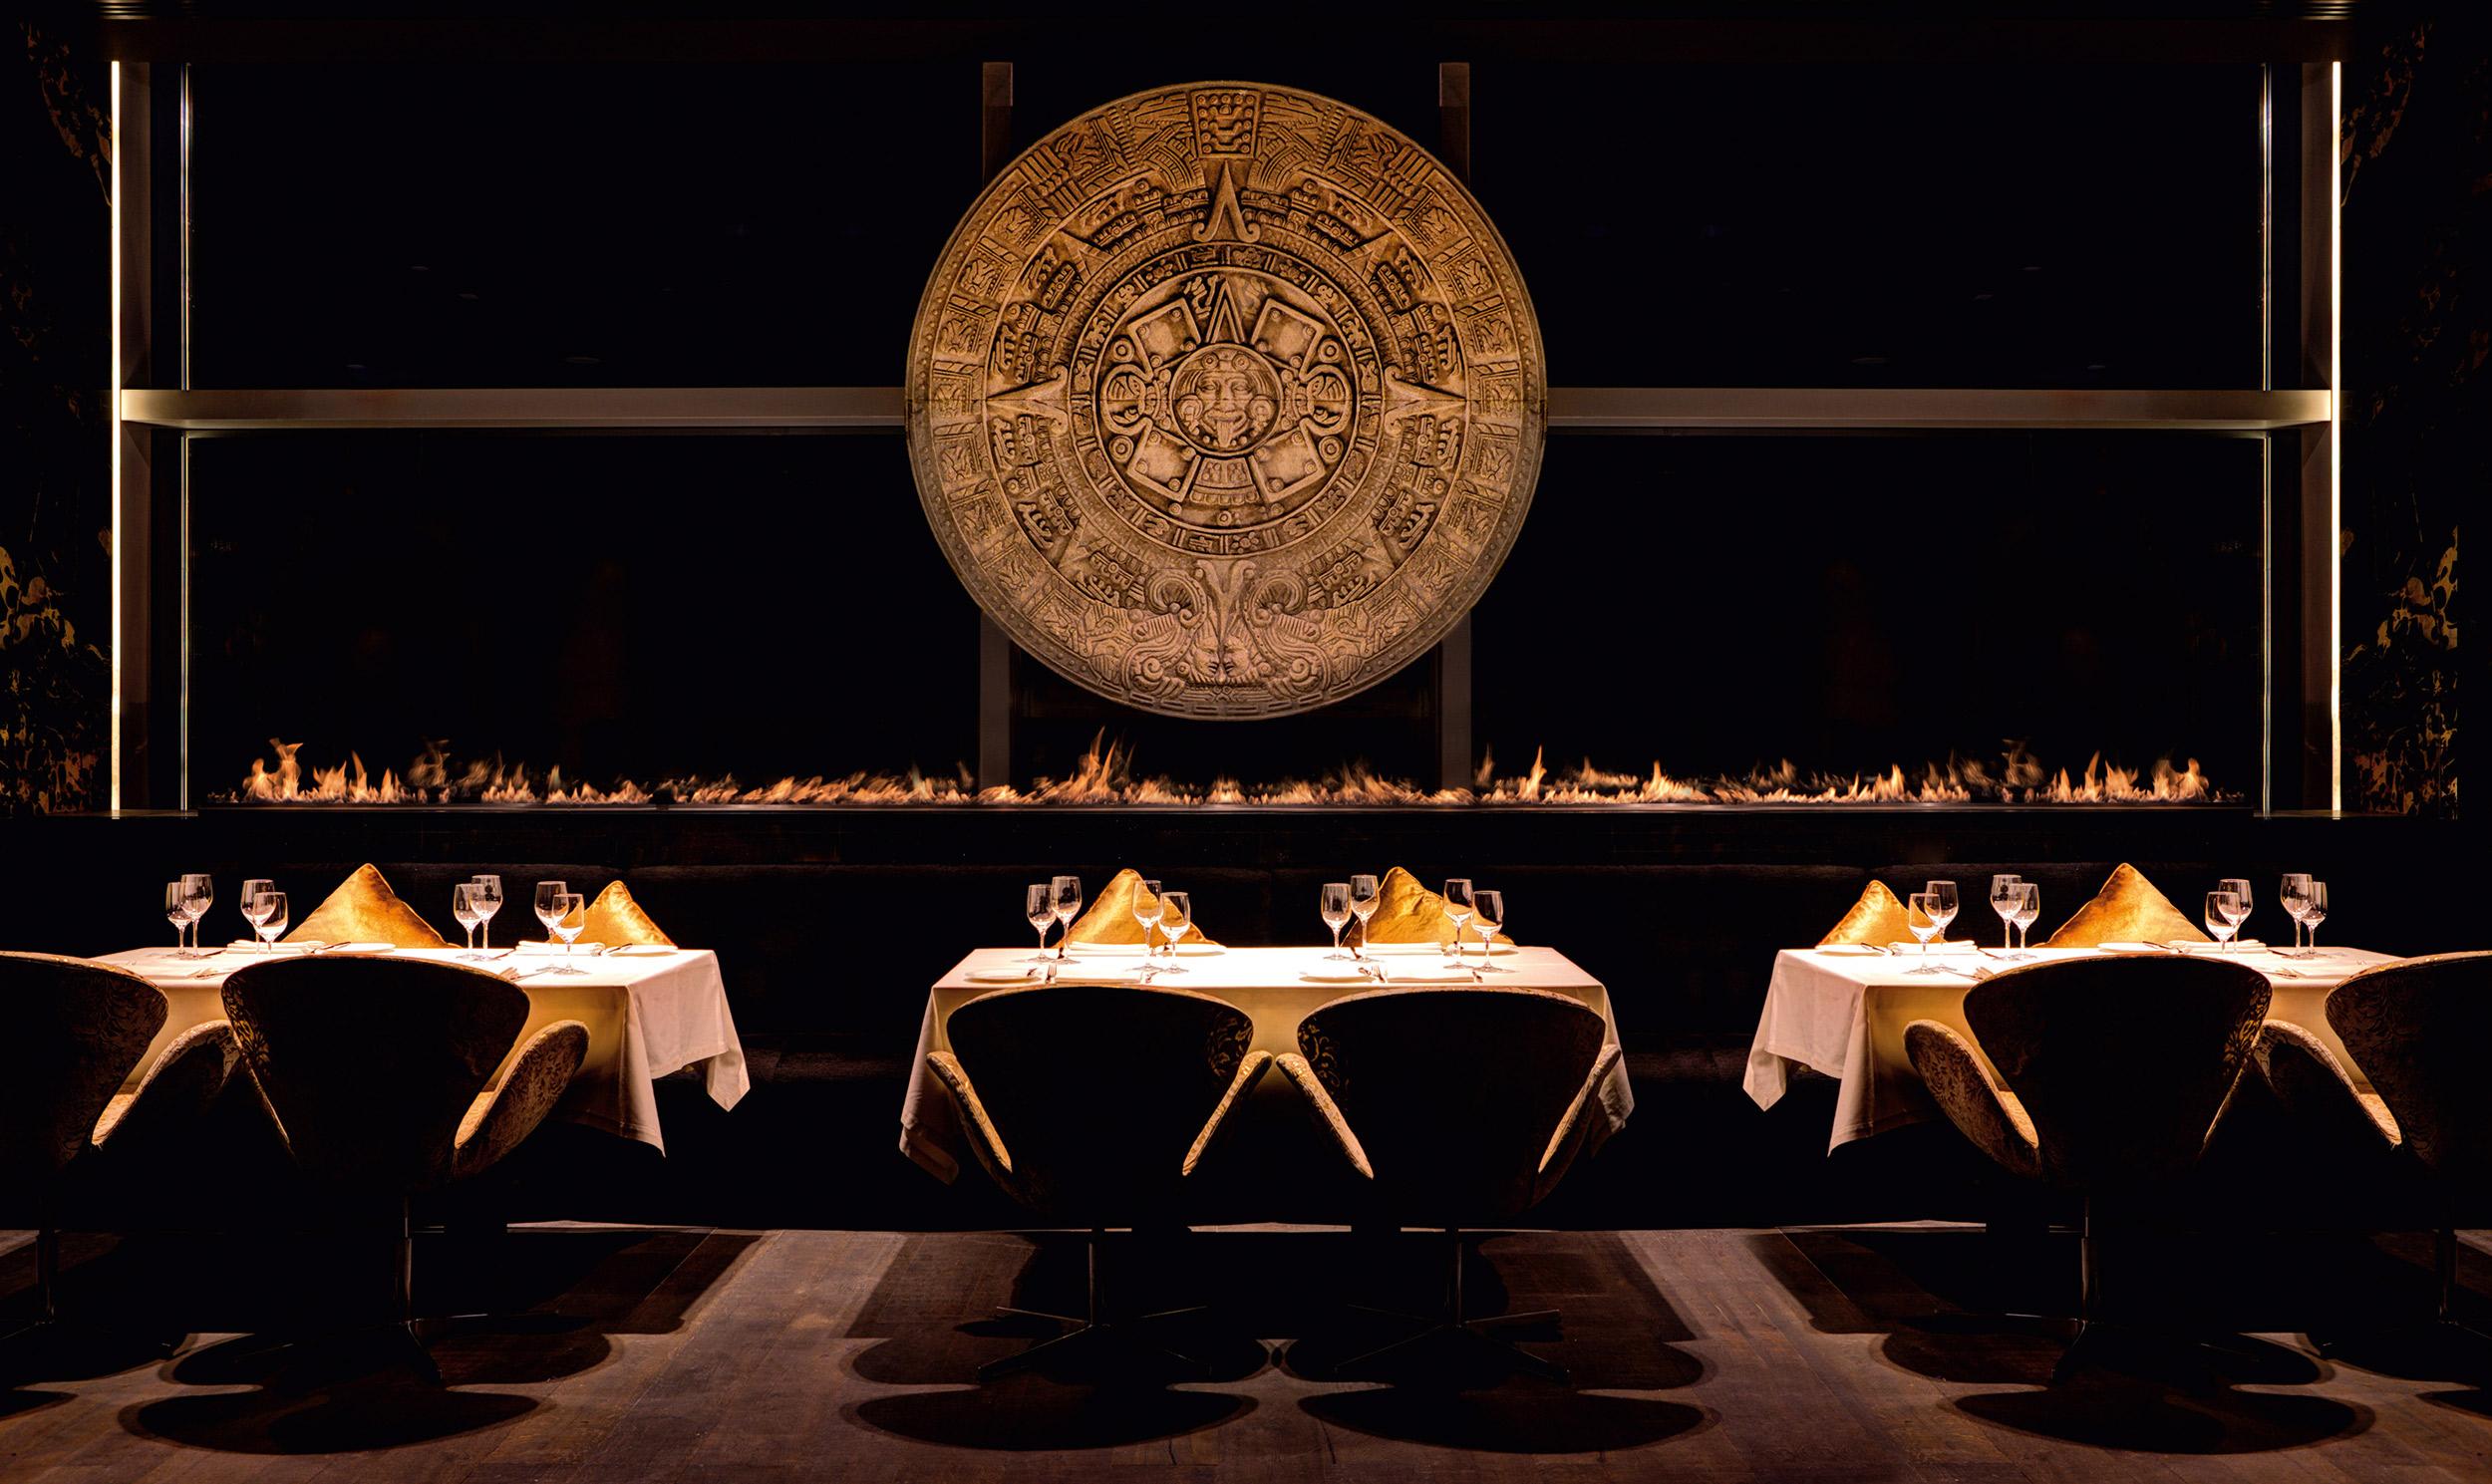 Fire-Line-Automatic-Planika-Izel-Restaurant-Conrad-Dubai-UAE-Designed-by-Patricia-Holler-WA-International-2.jpg